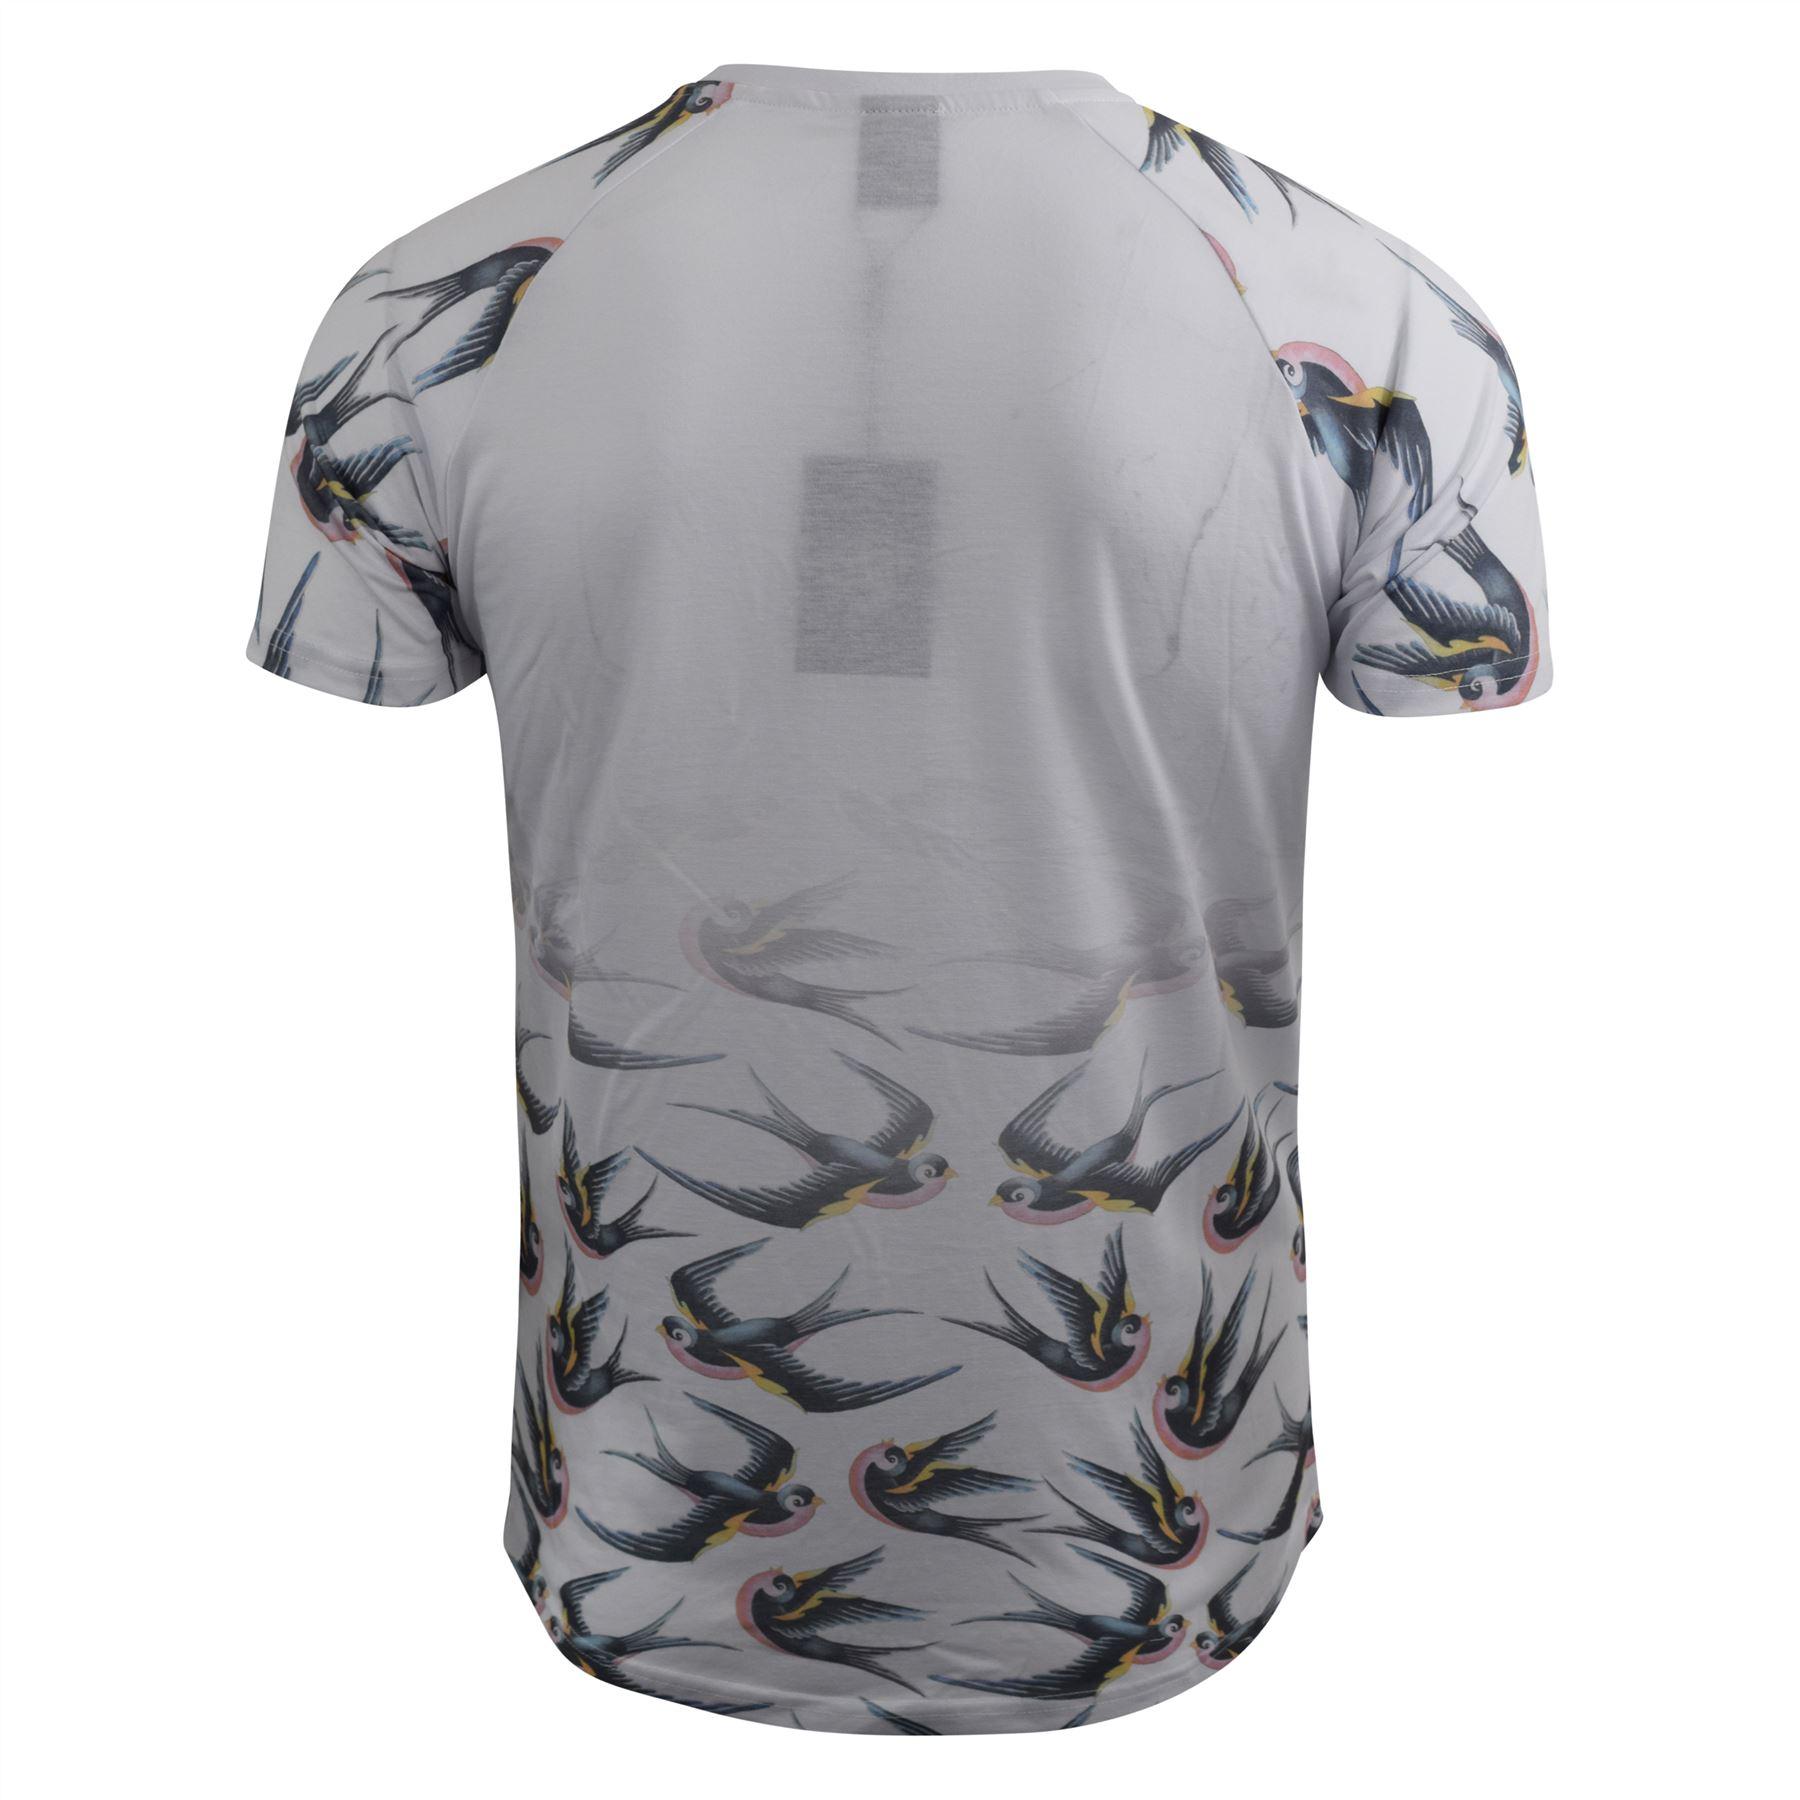 Mens-T-Shirt-Crosshatch-Short-Sleeved-Raglan-Print-Tee-Top-Averys thumbnail 5